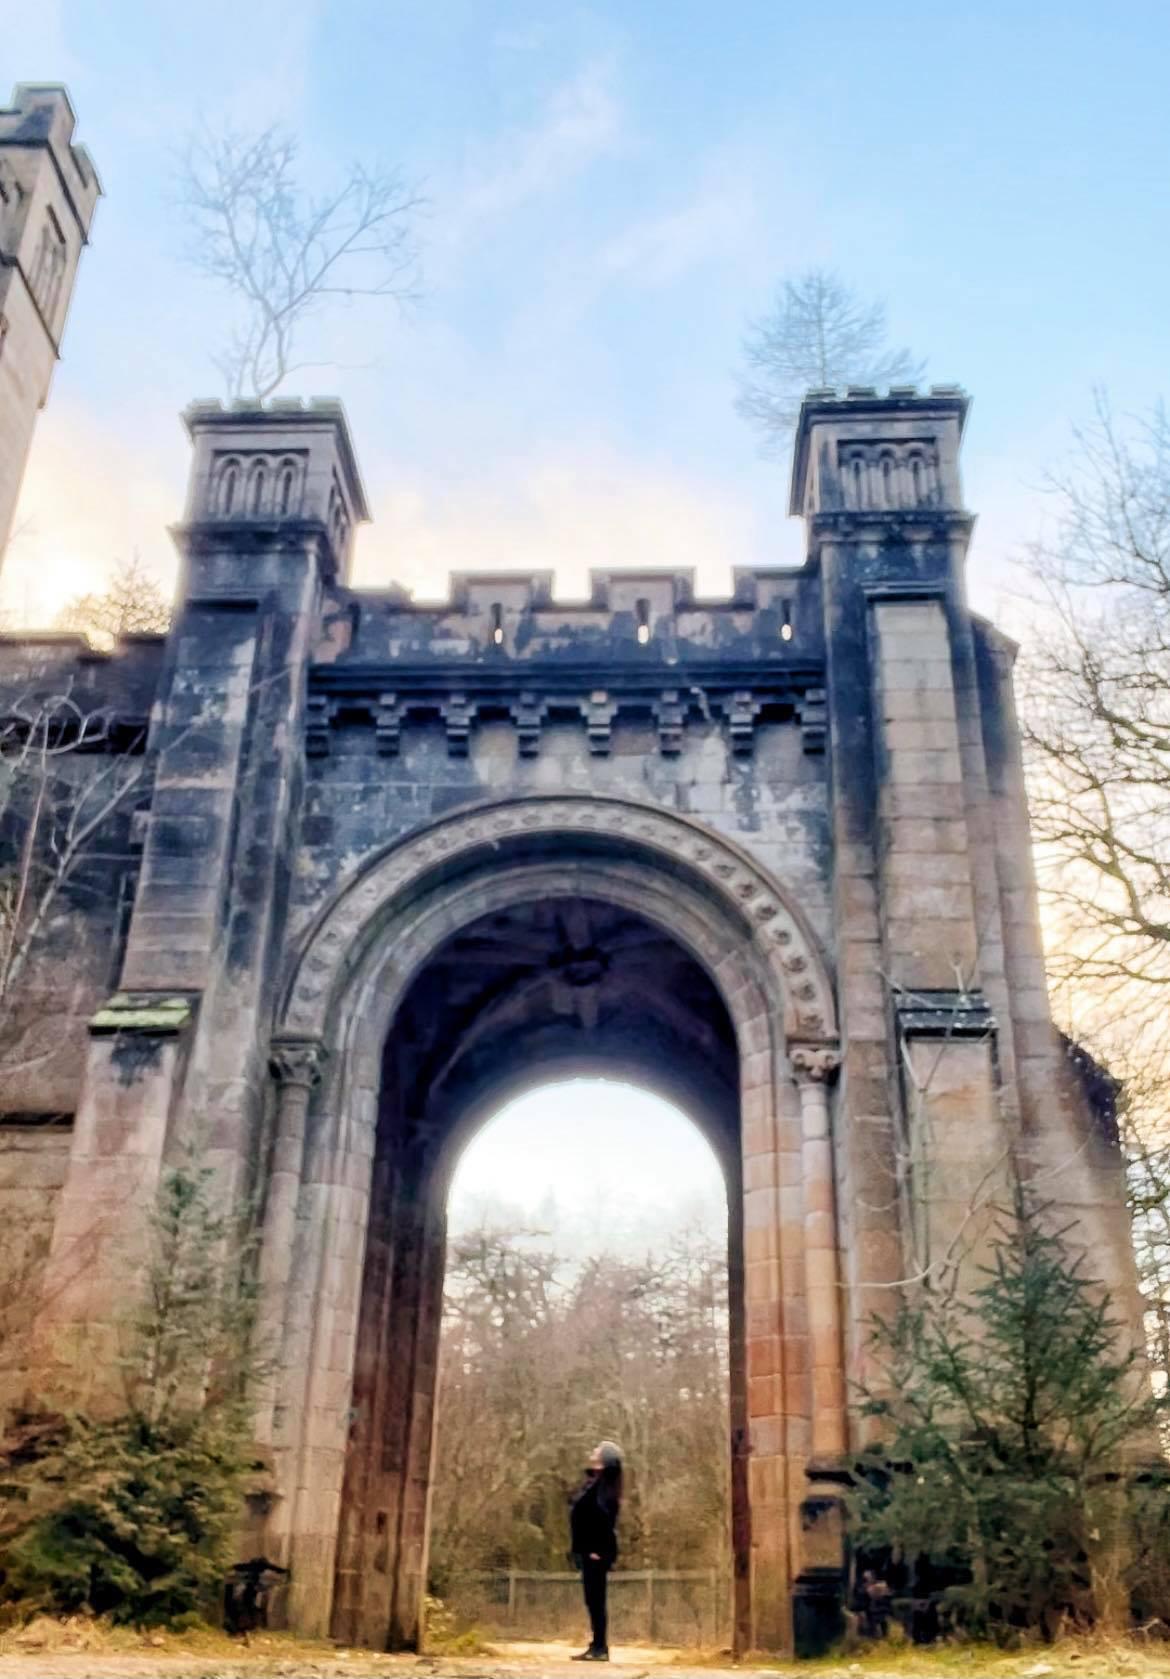 Stone Arch Lennox Town Hospital